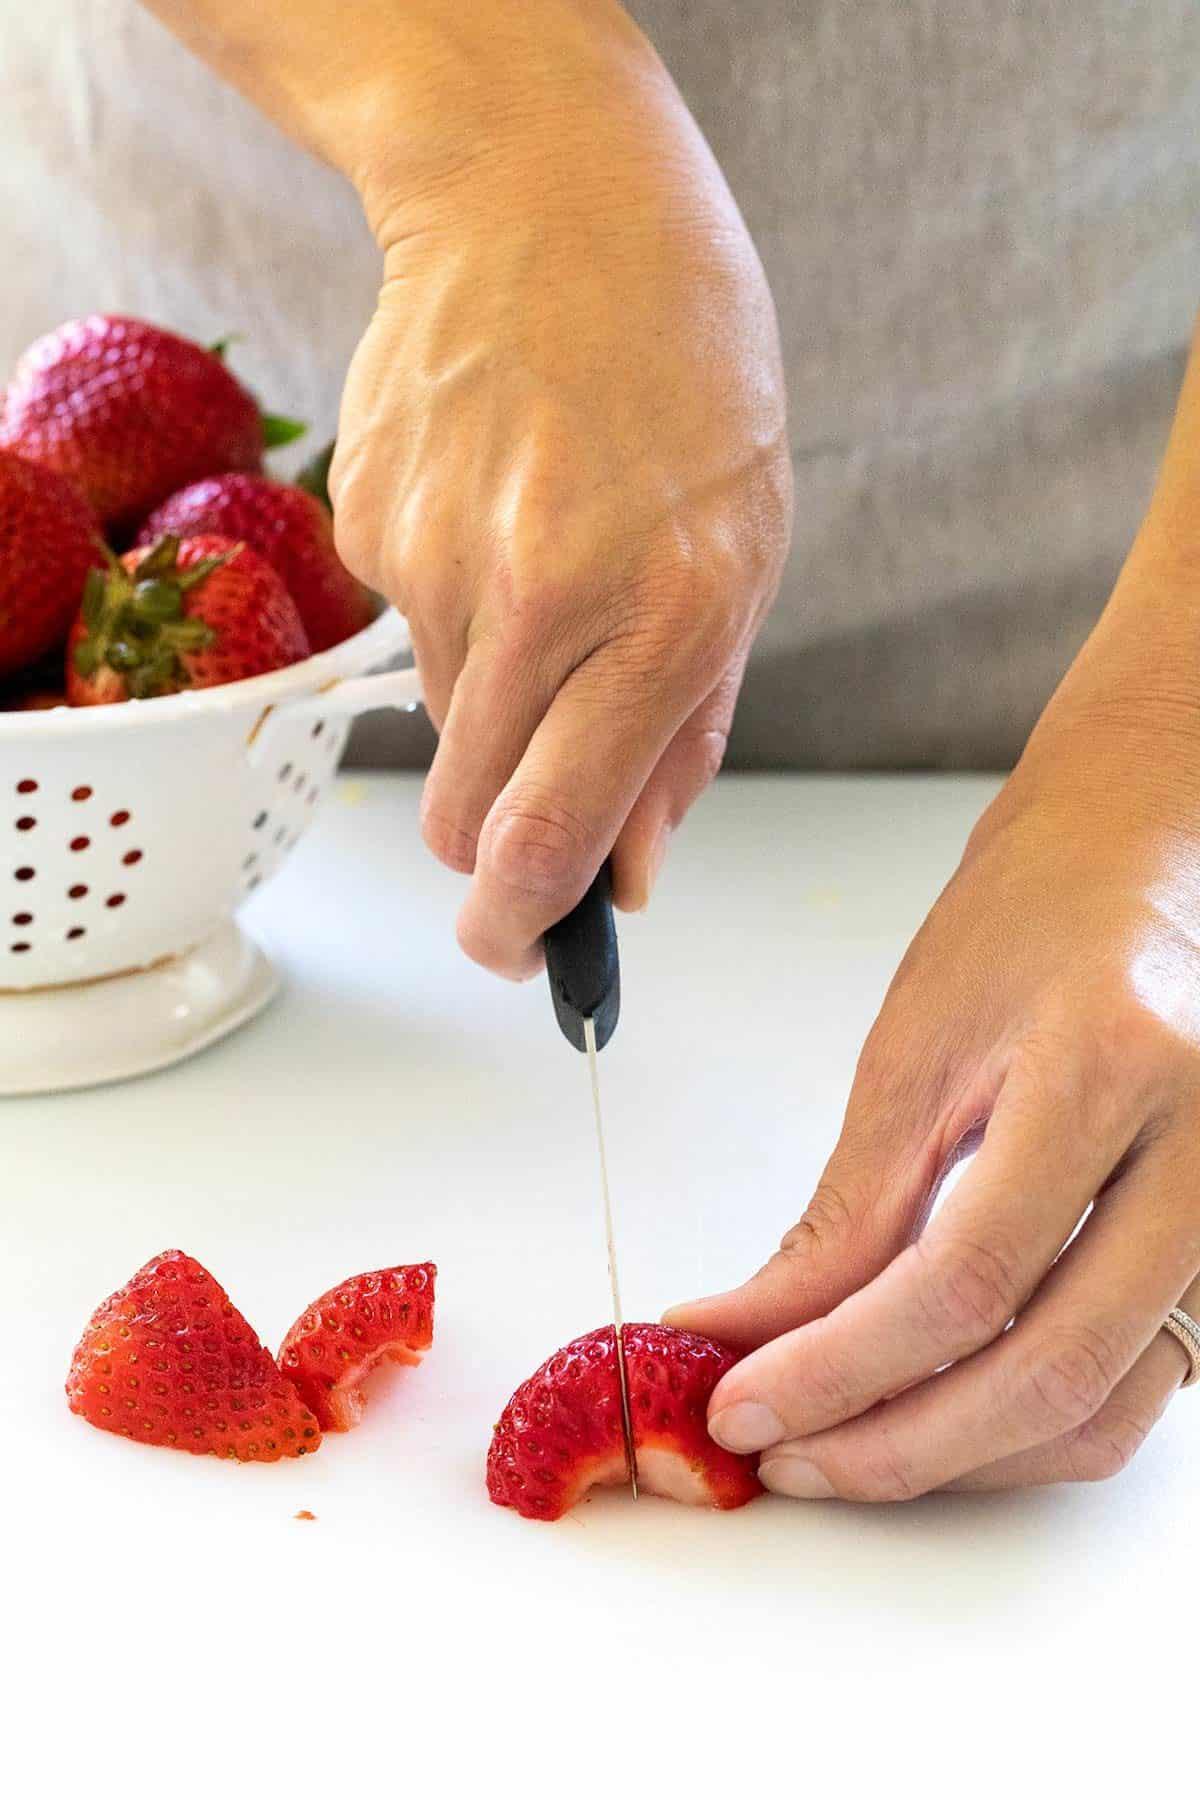 cutting strawberries in quarters